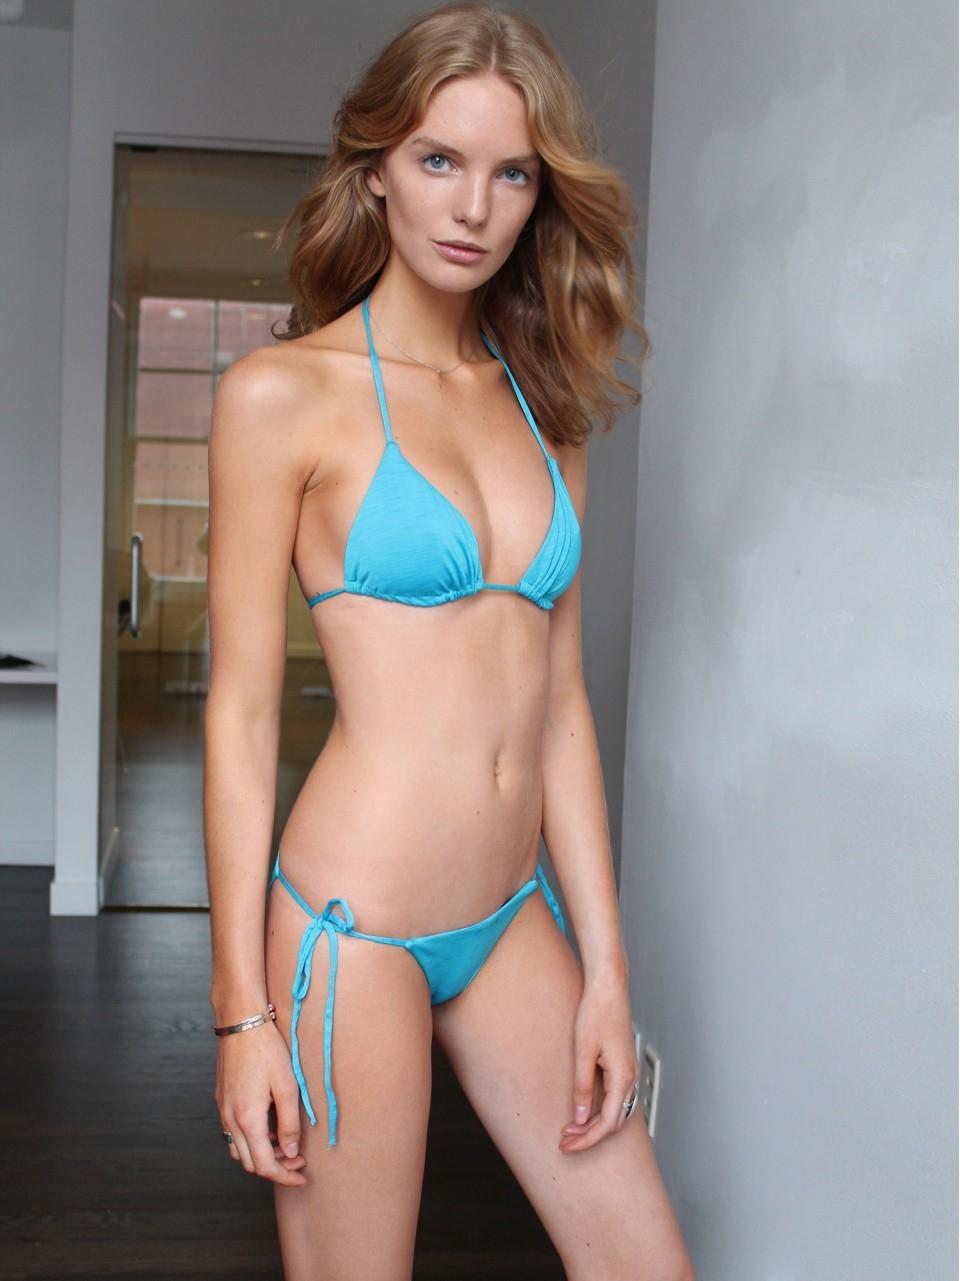 Pics Syren Picston nude (27 photo), Ass, Leaked, Instagram, underwear 2020